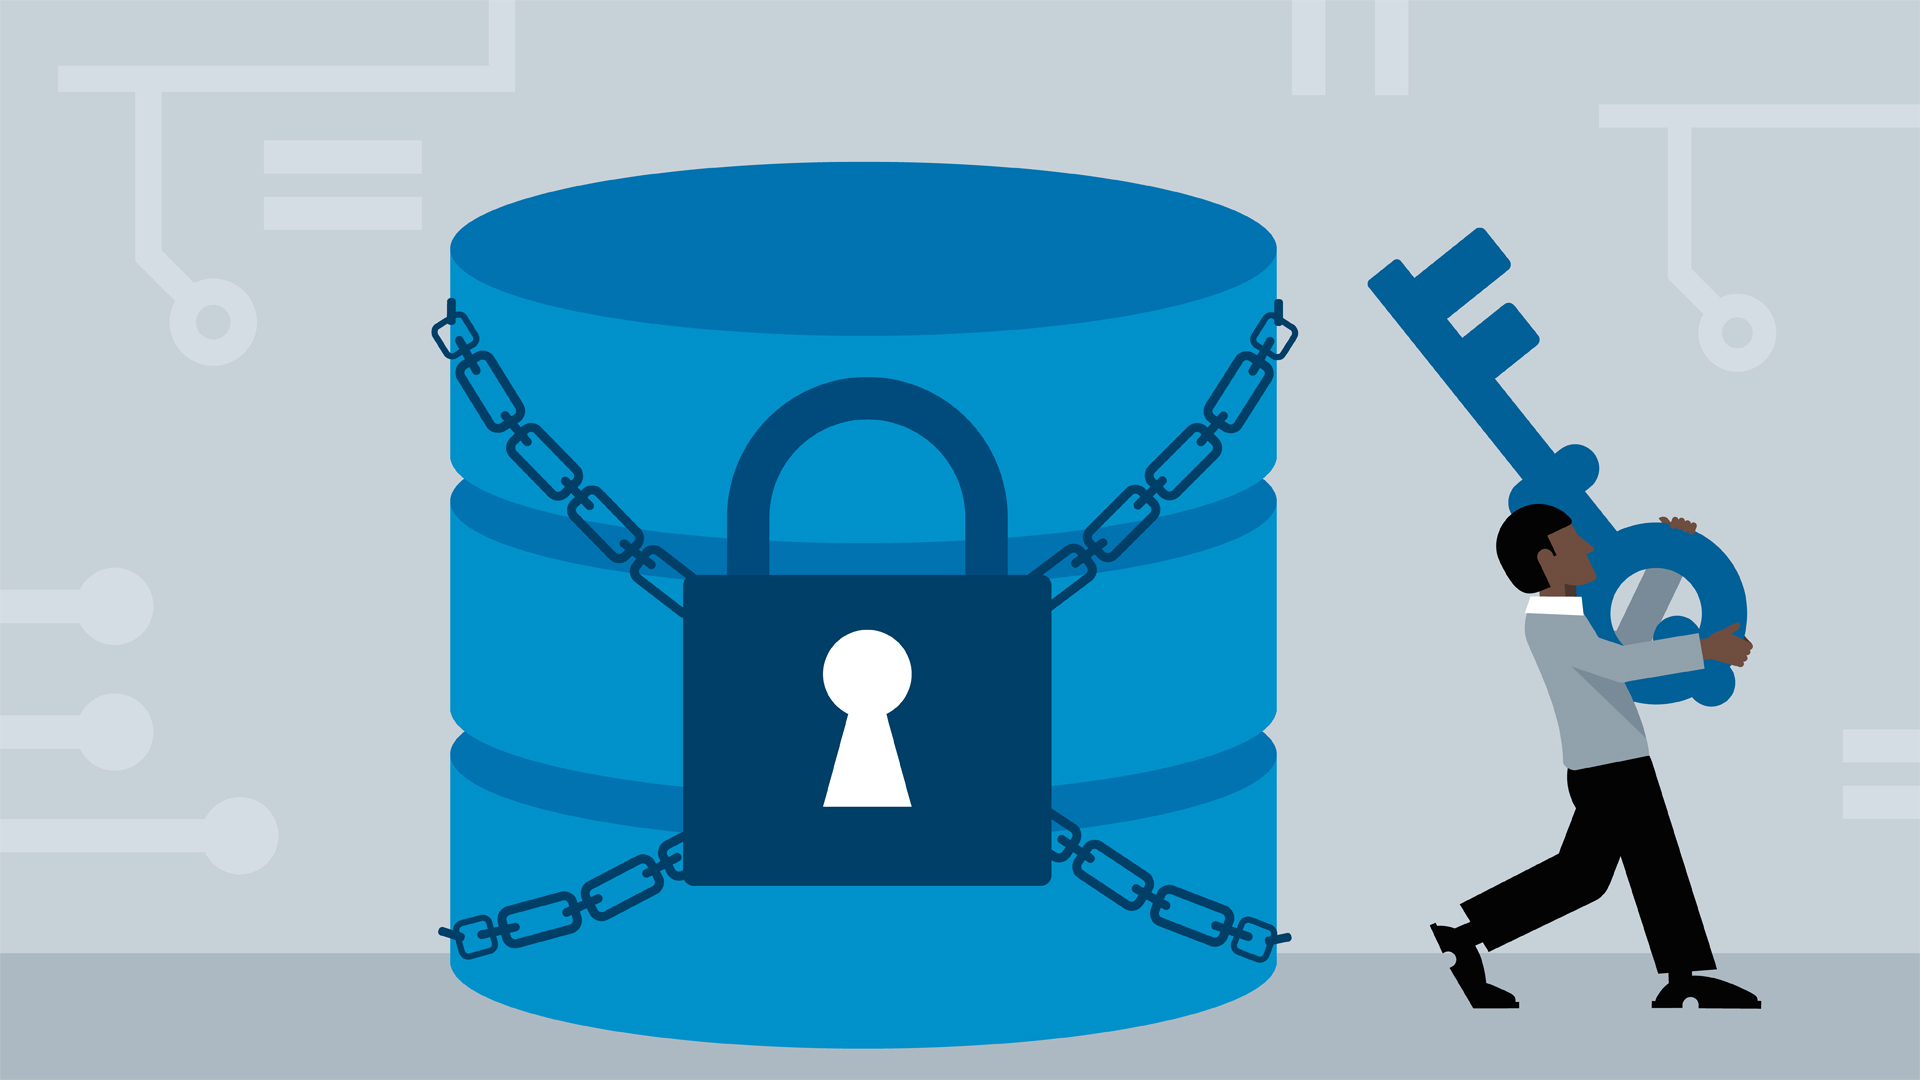 [Lynda] MongoDB: Security